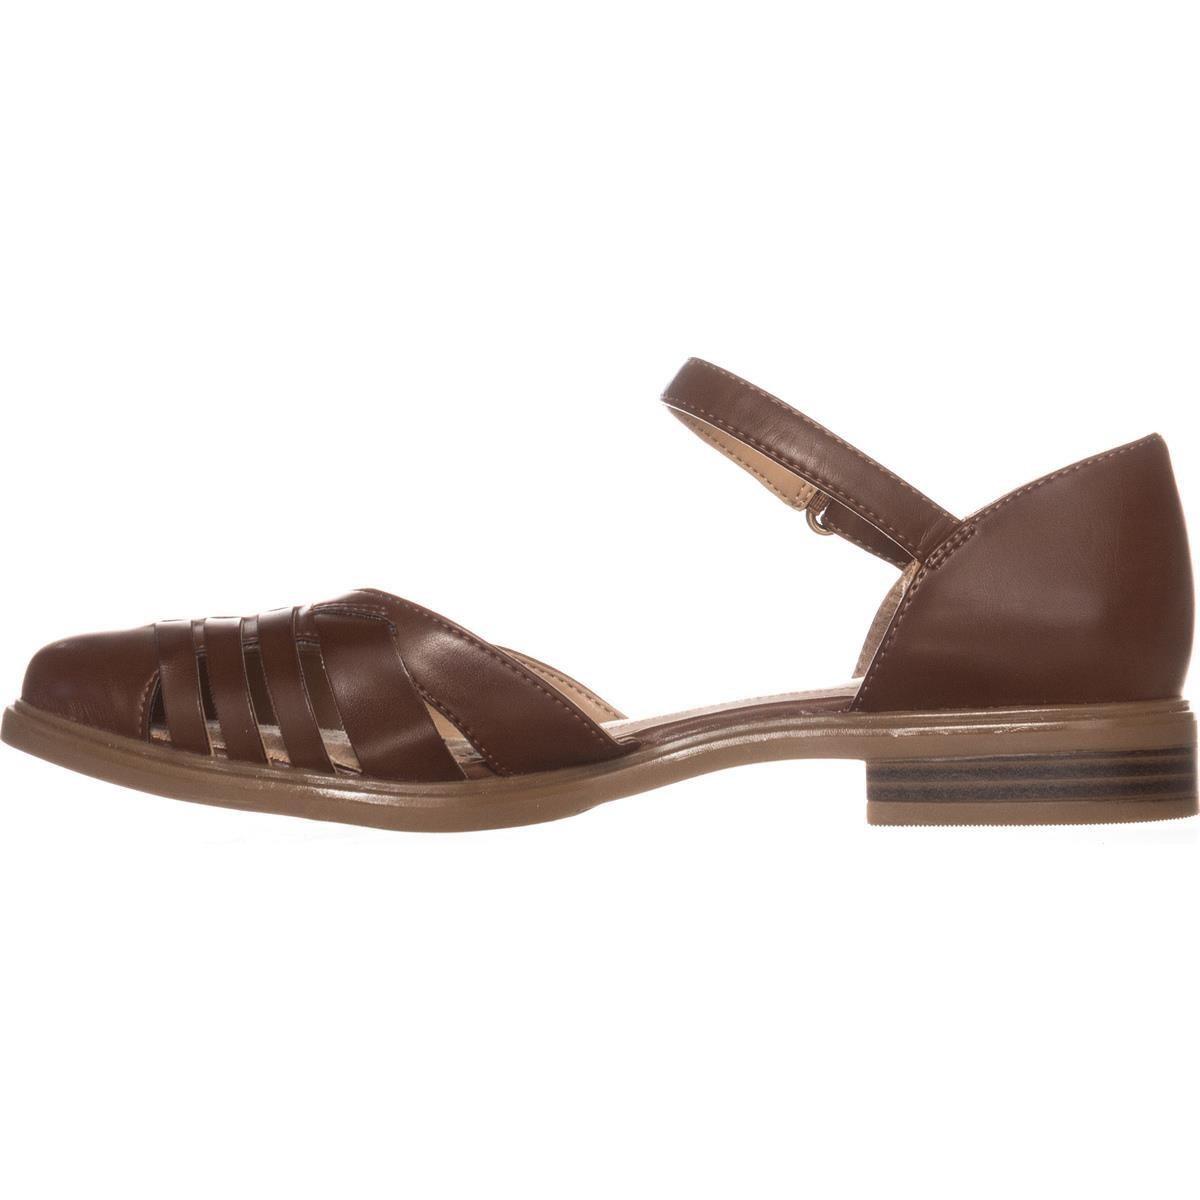 Naturalizer Bethany Damenschuhe Heeled Sandales Tan 10 US   8 8  UK ... 8425bf